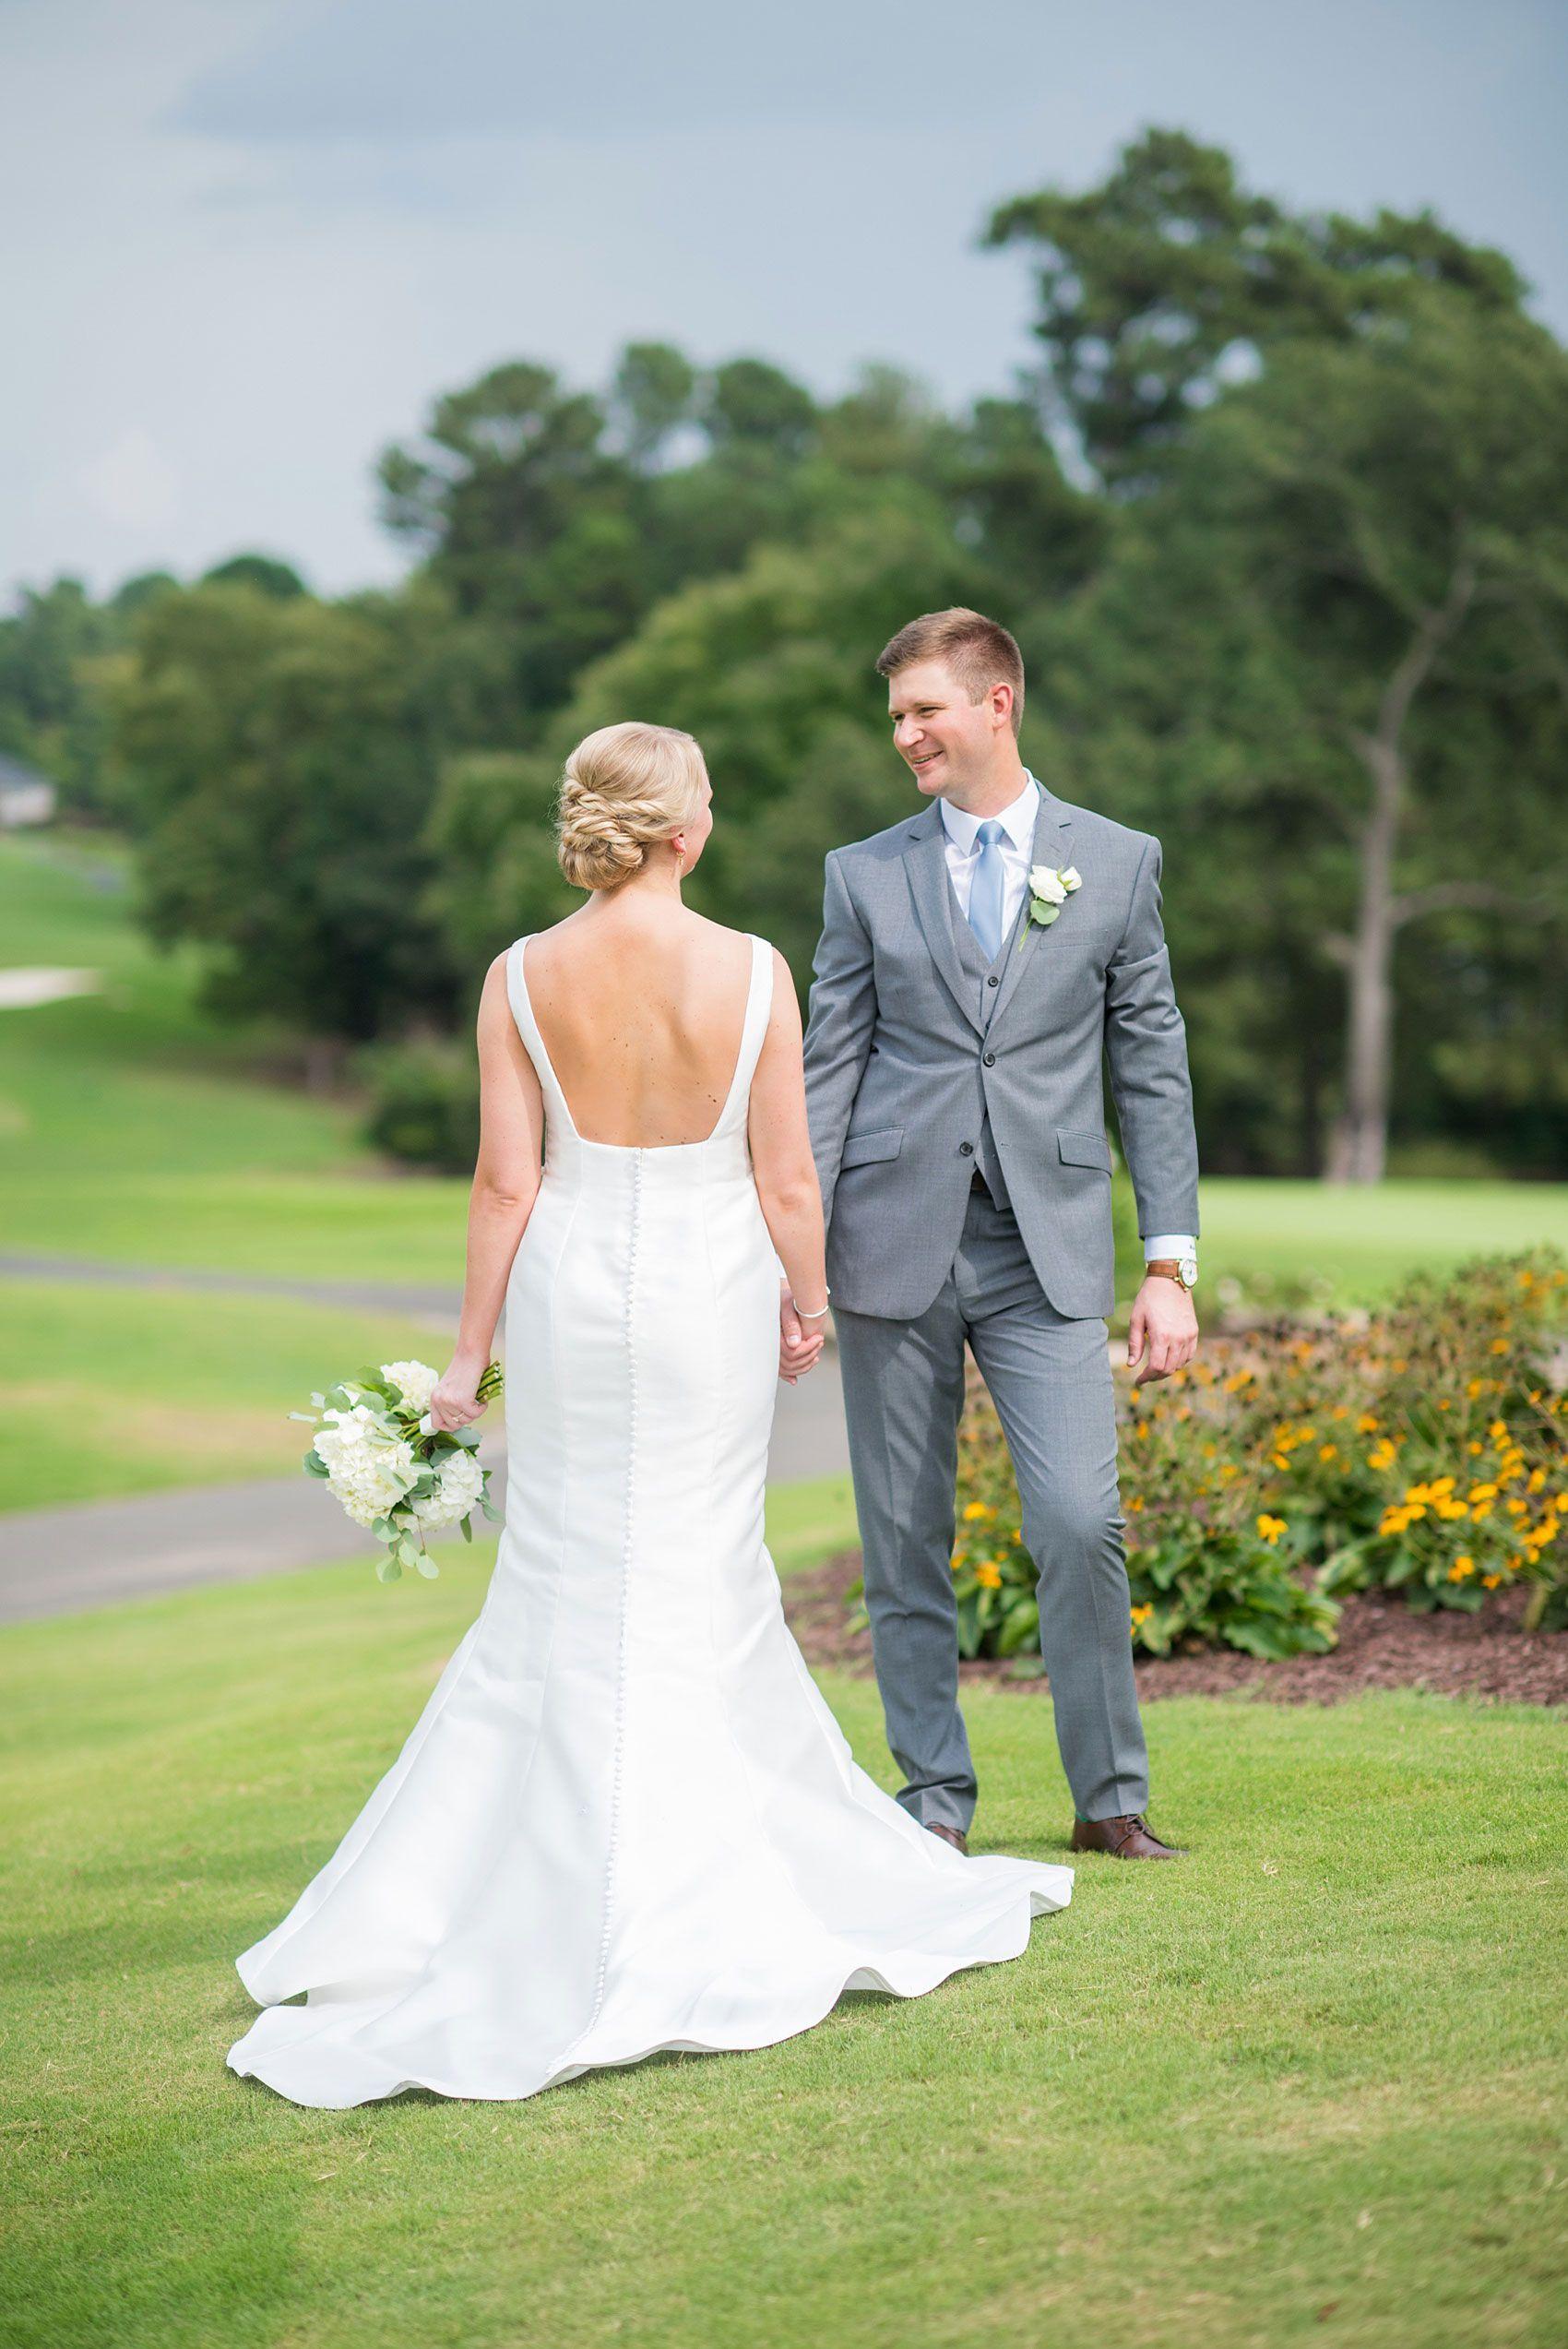 durham wedding photographer at croasdaile country club